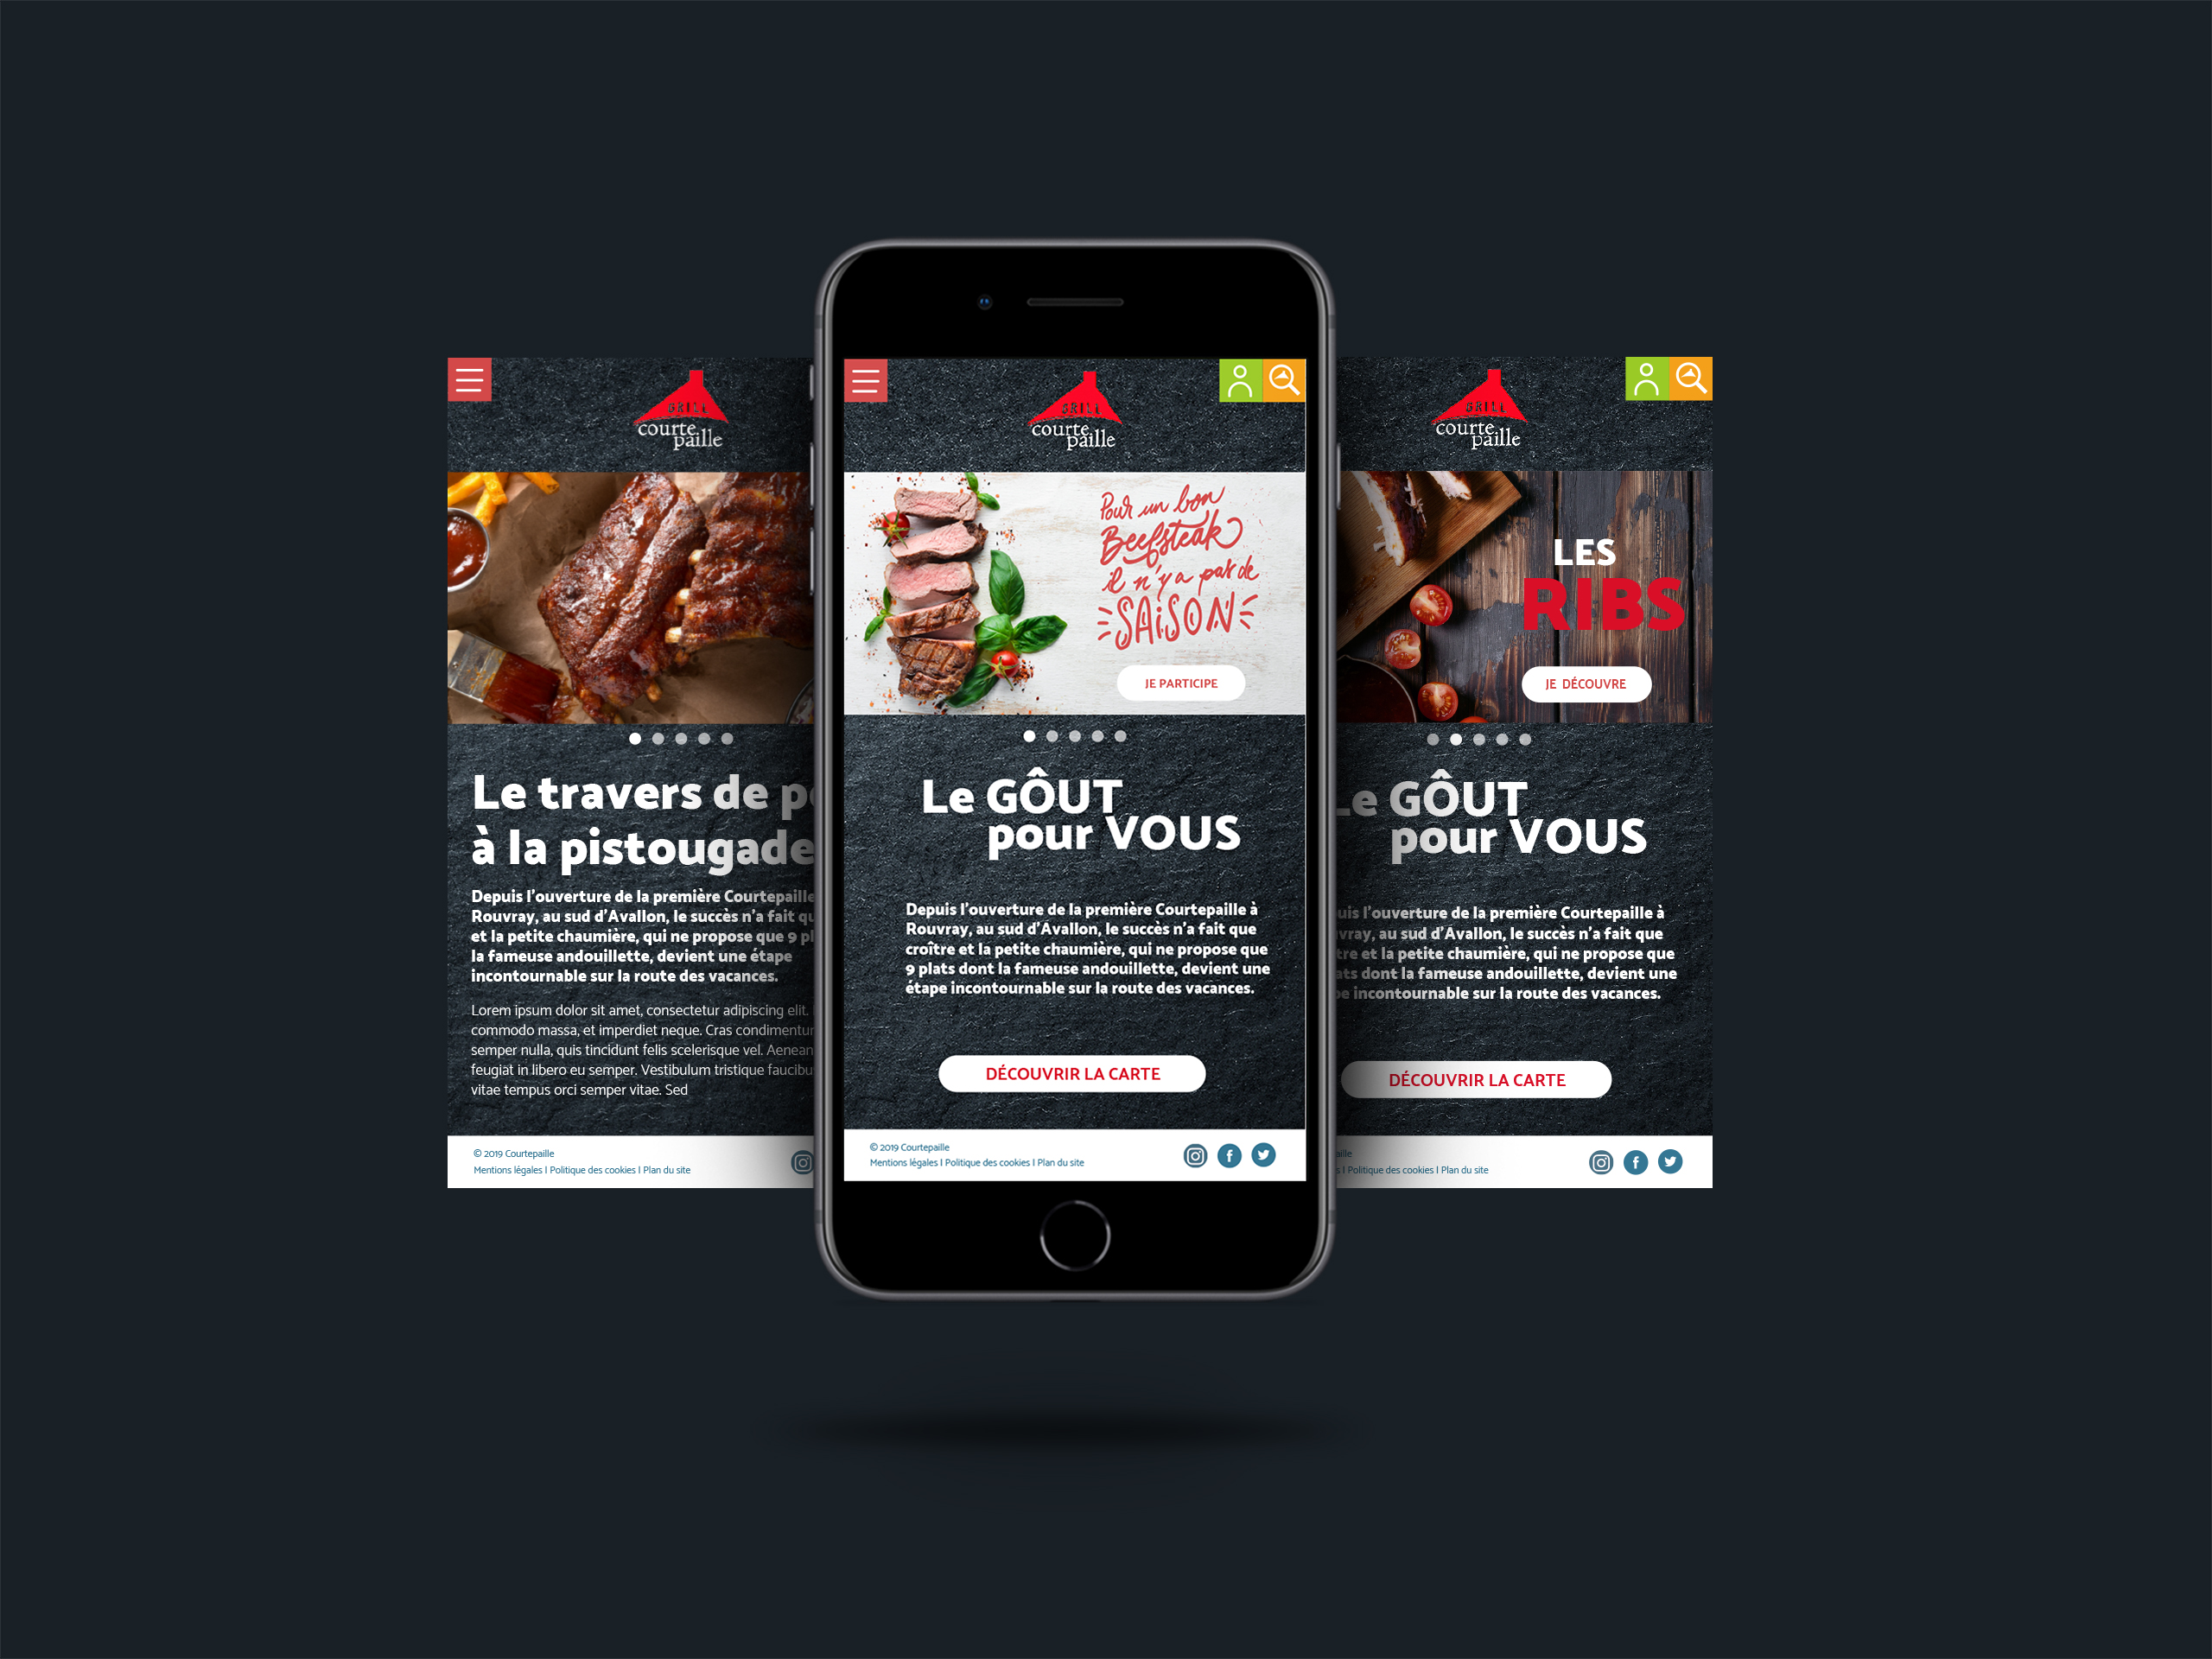 Courtepaille site mobile